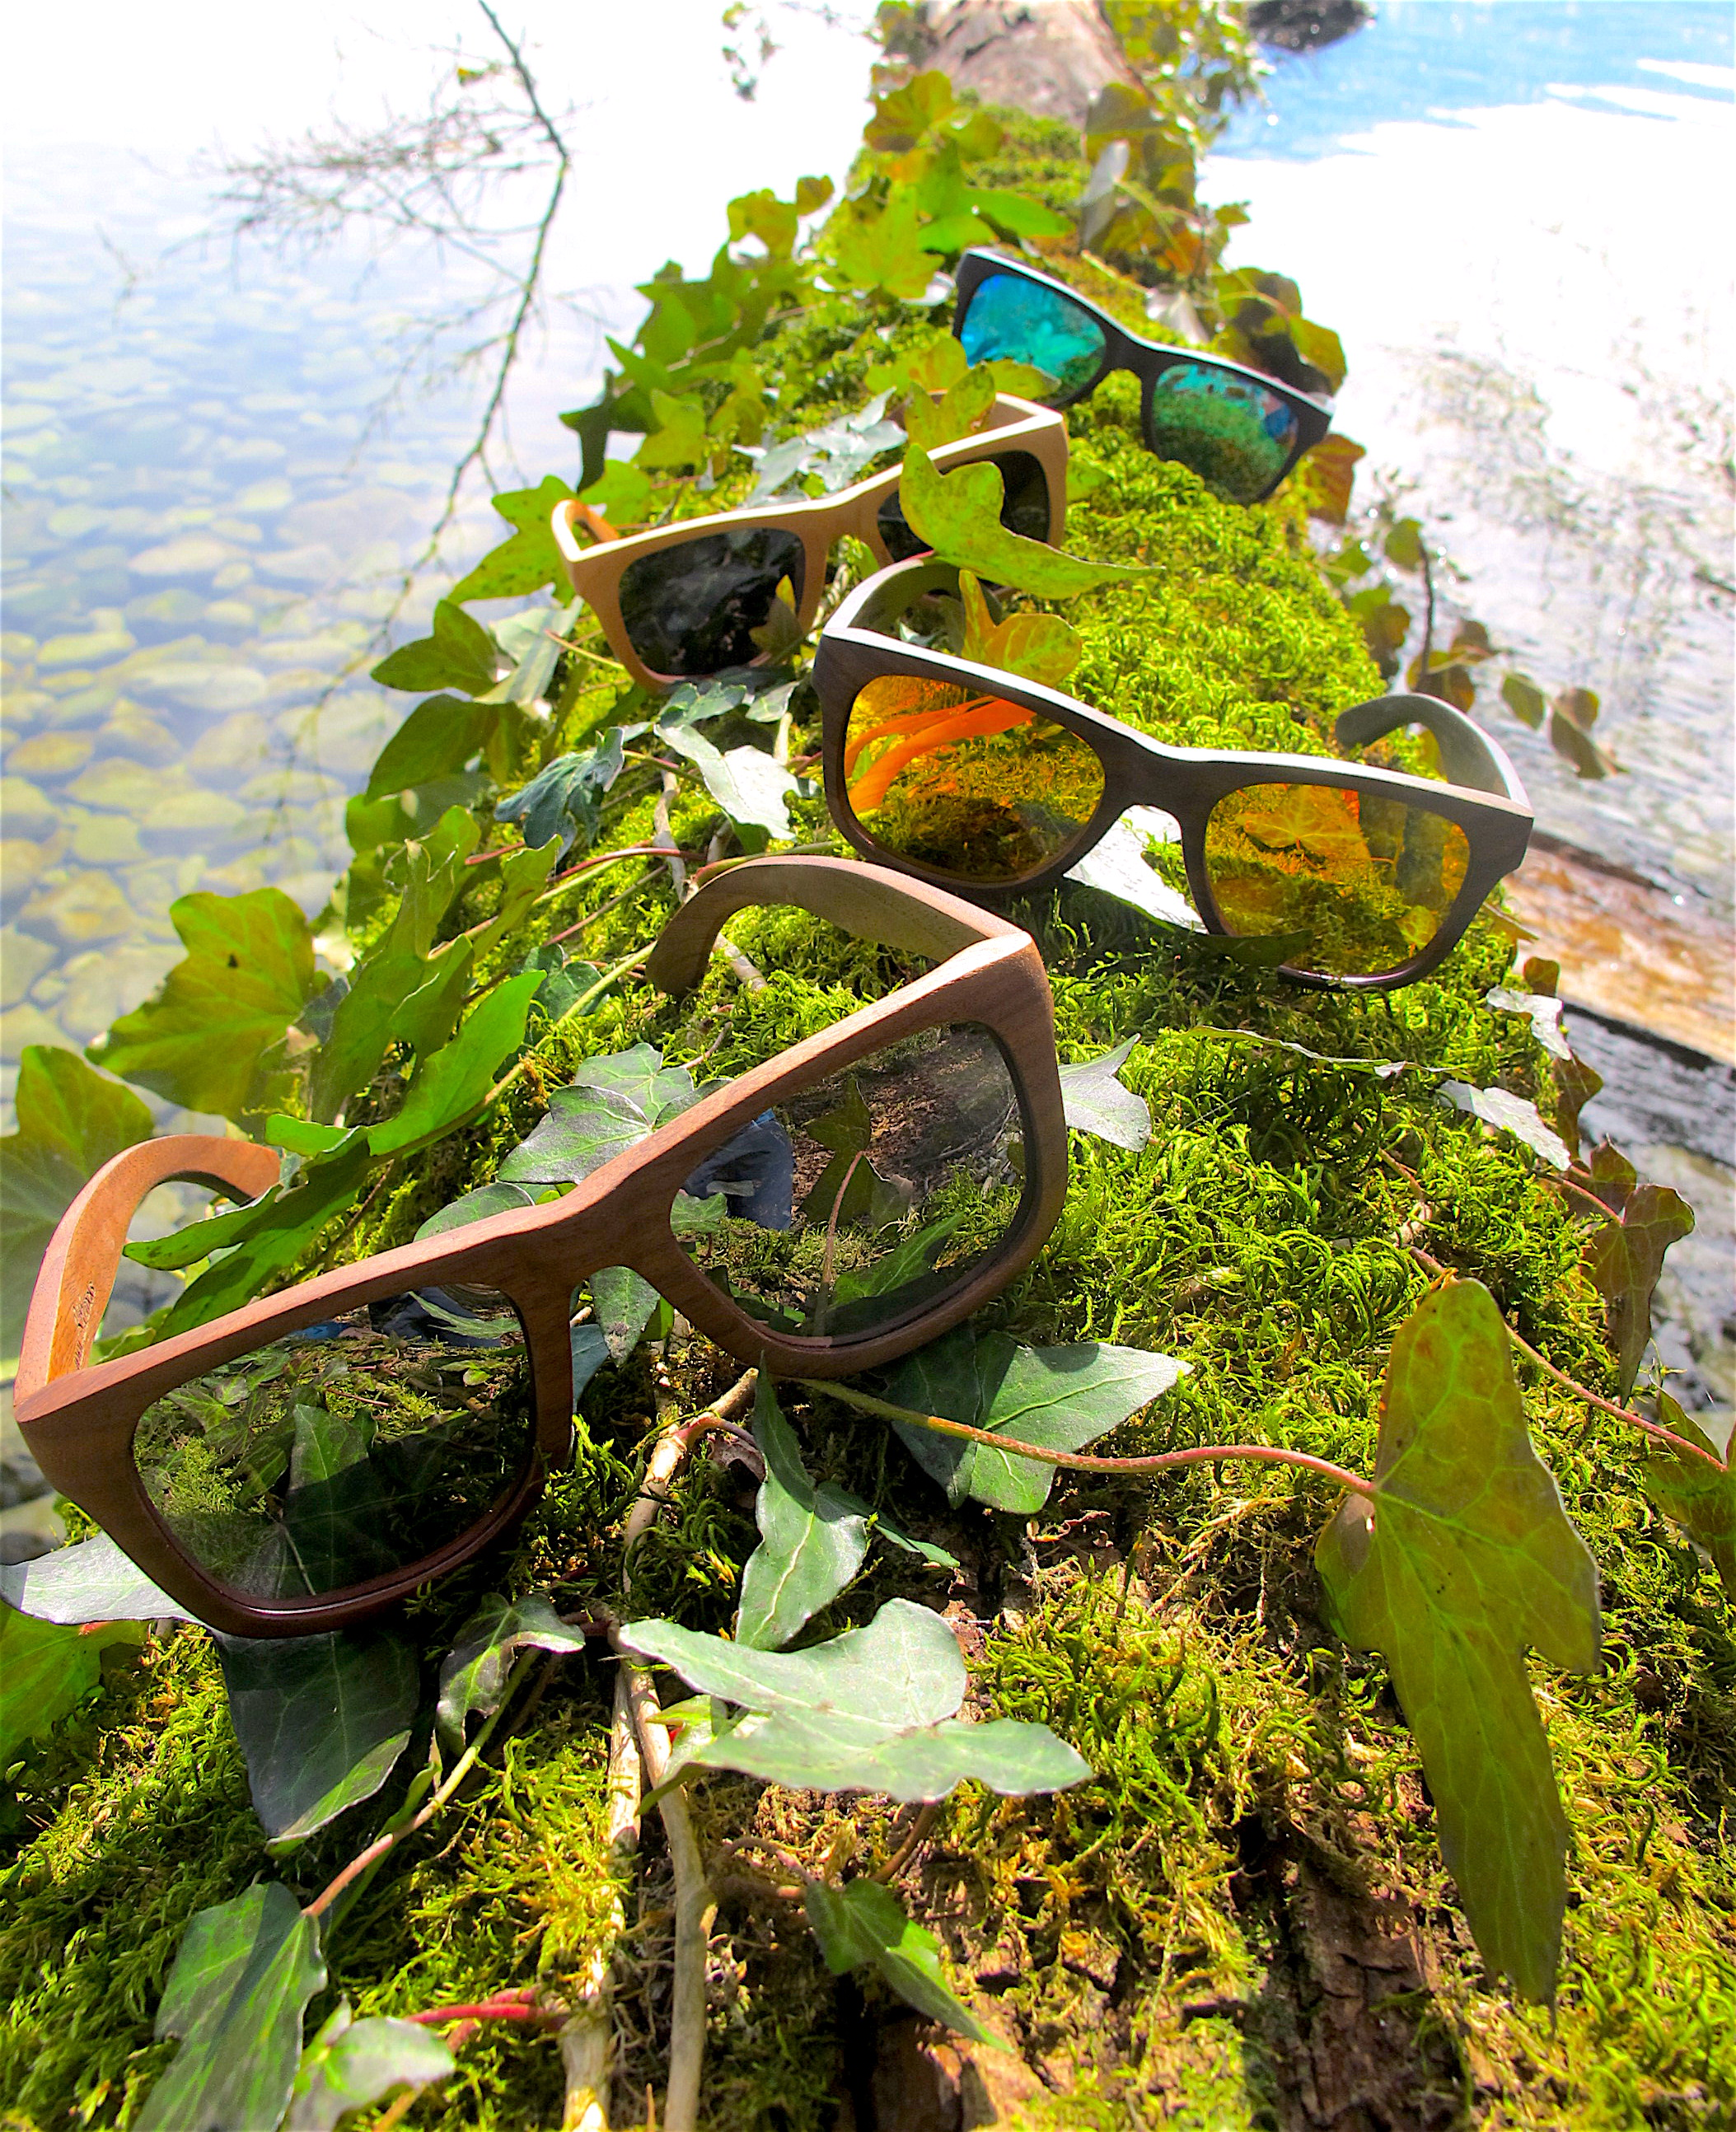 Bixi Rocks Brille 3